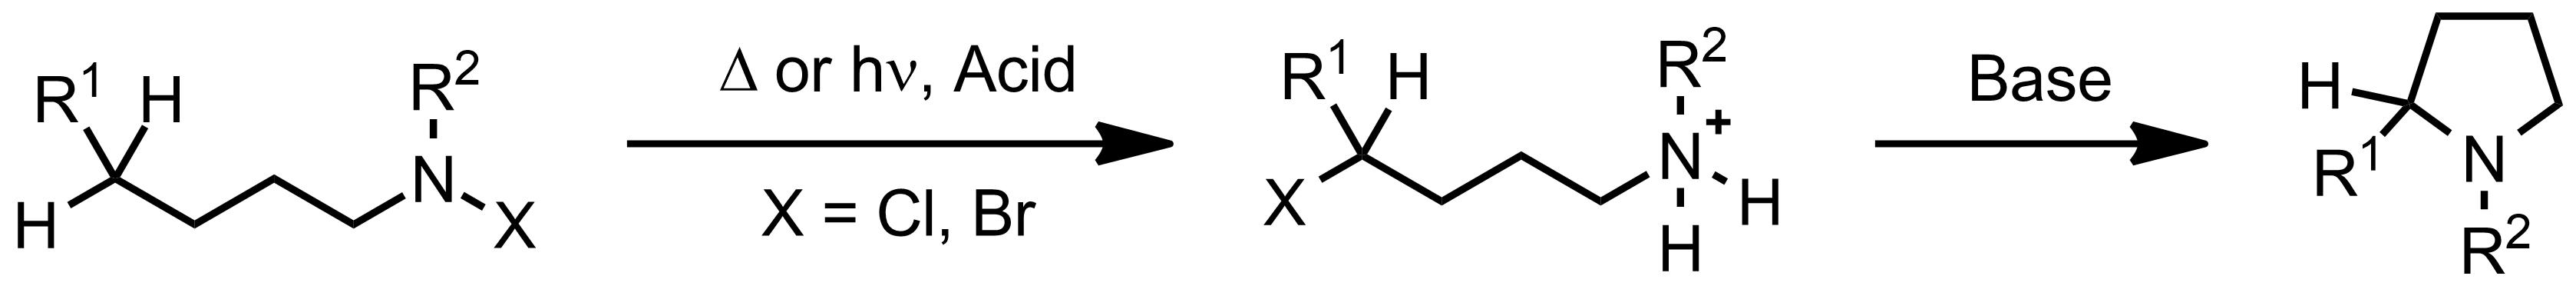 Schematic representation of the Hofmann-Löffler-Freytag Reaction.